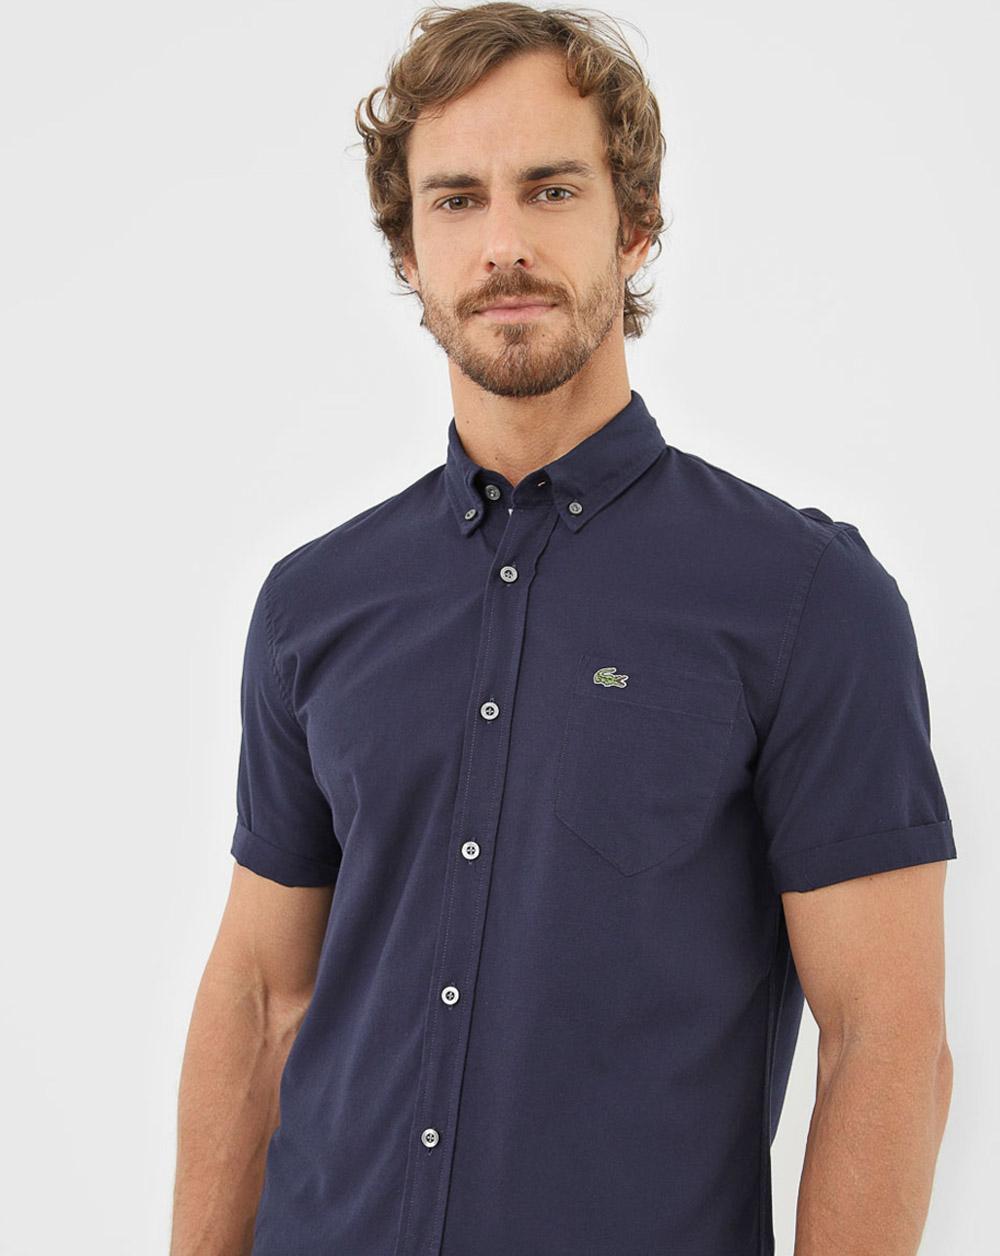 Camisa Lacoste Reta Bolso Azul-Marinho